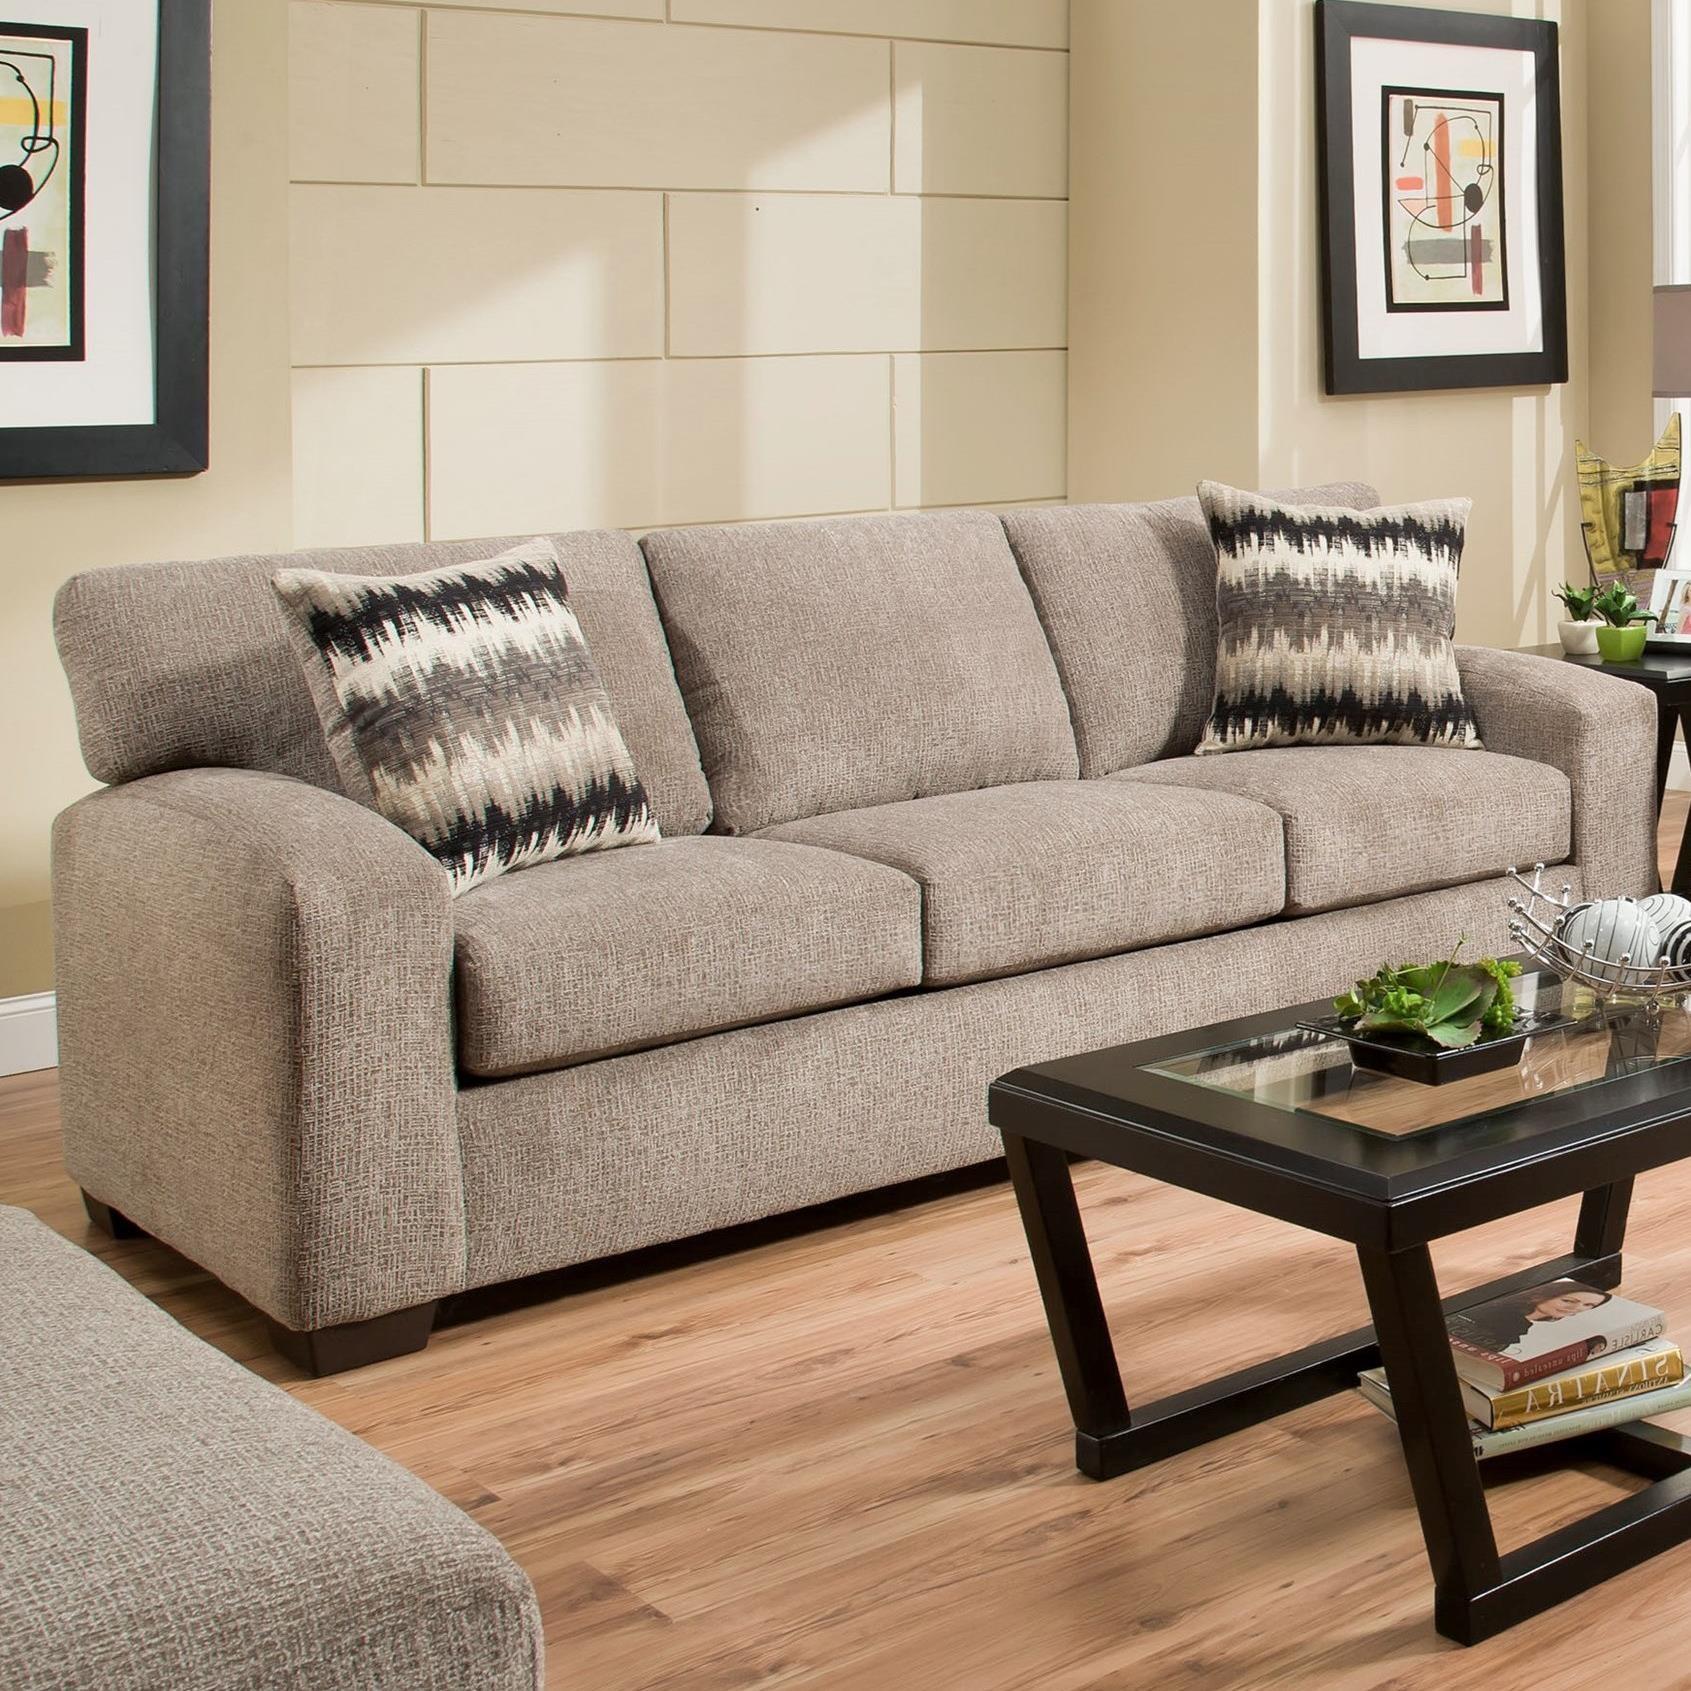 5250 Sofa by Peak Living at Prime Brothers Furniture